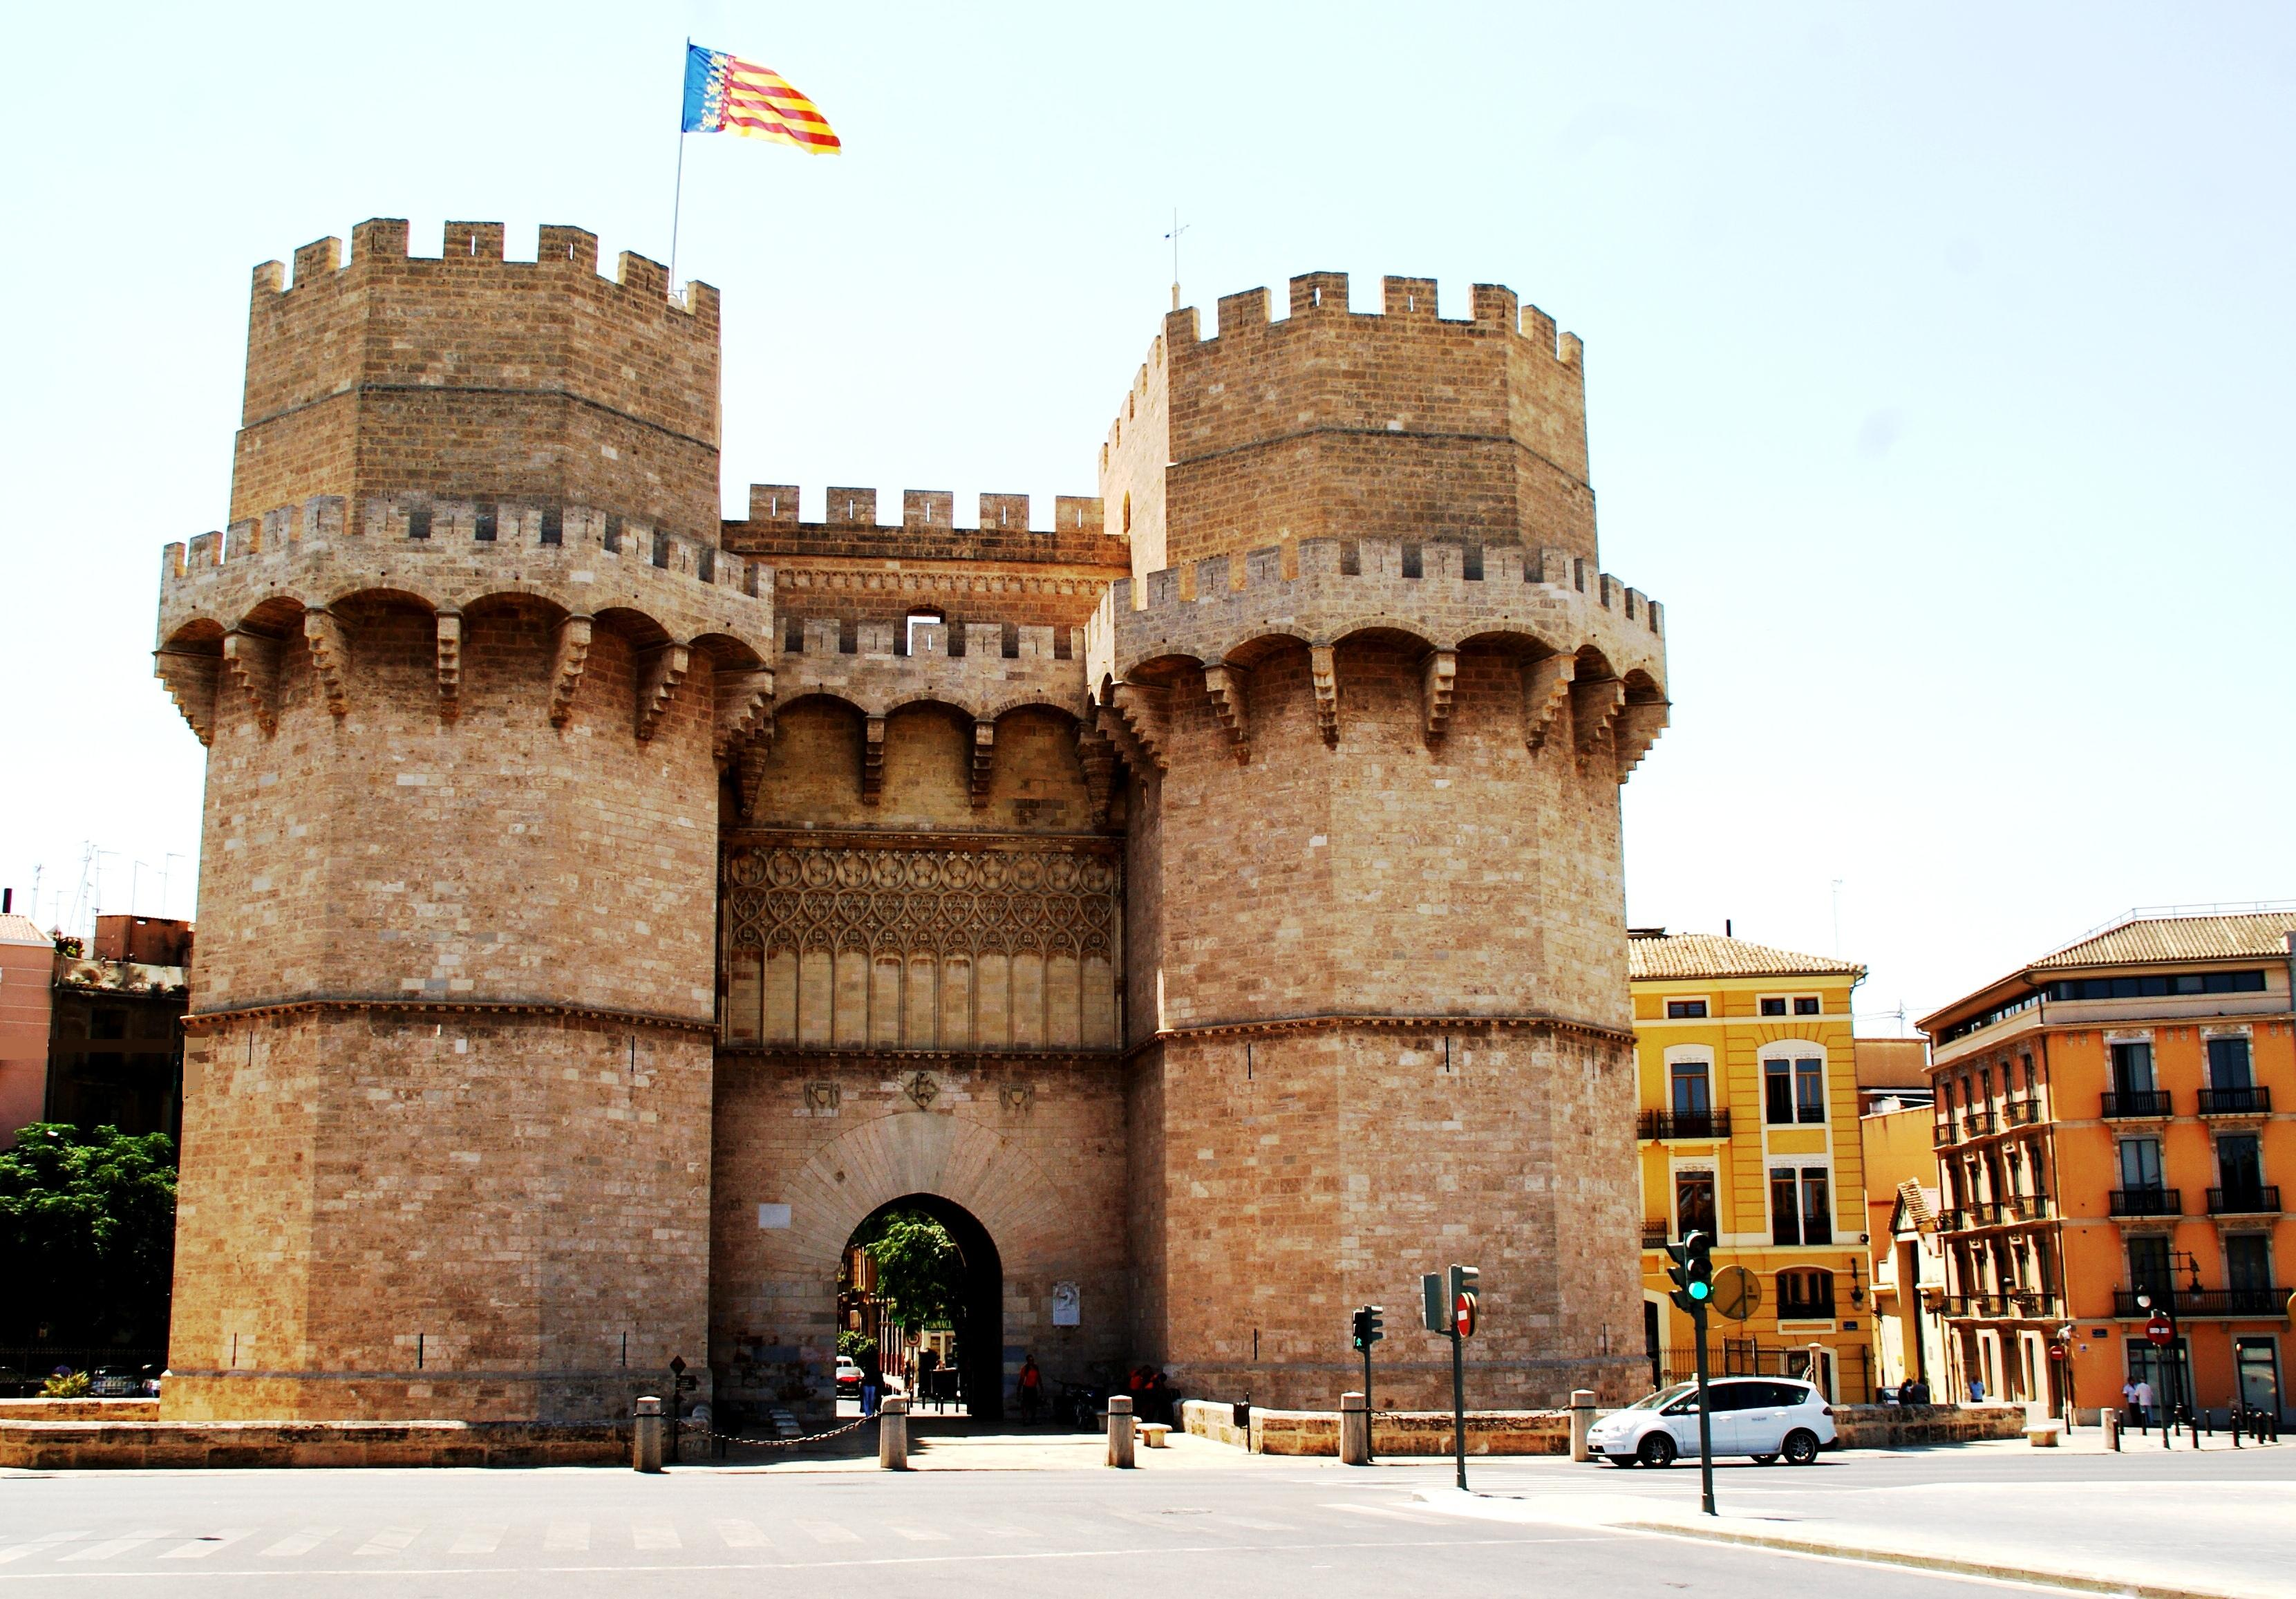 Serrano Tower